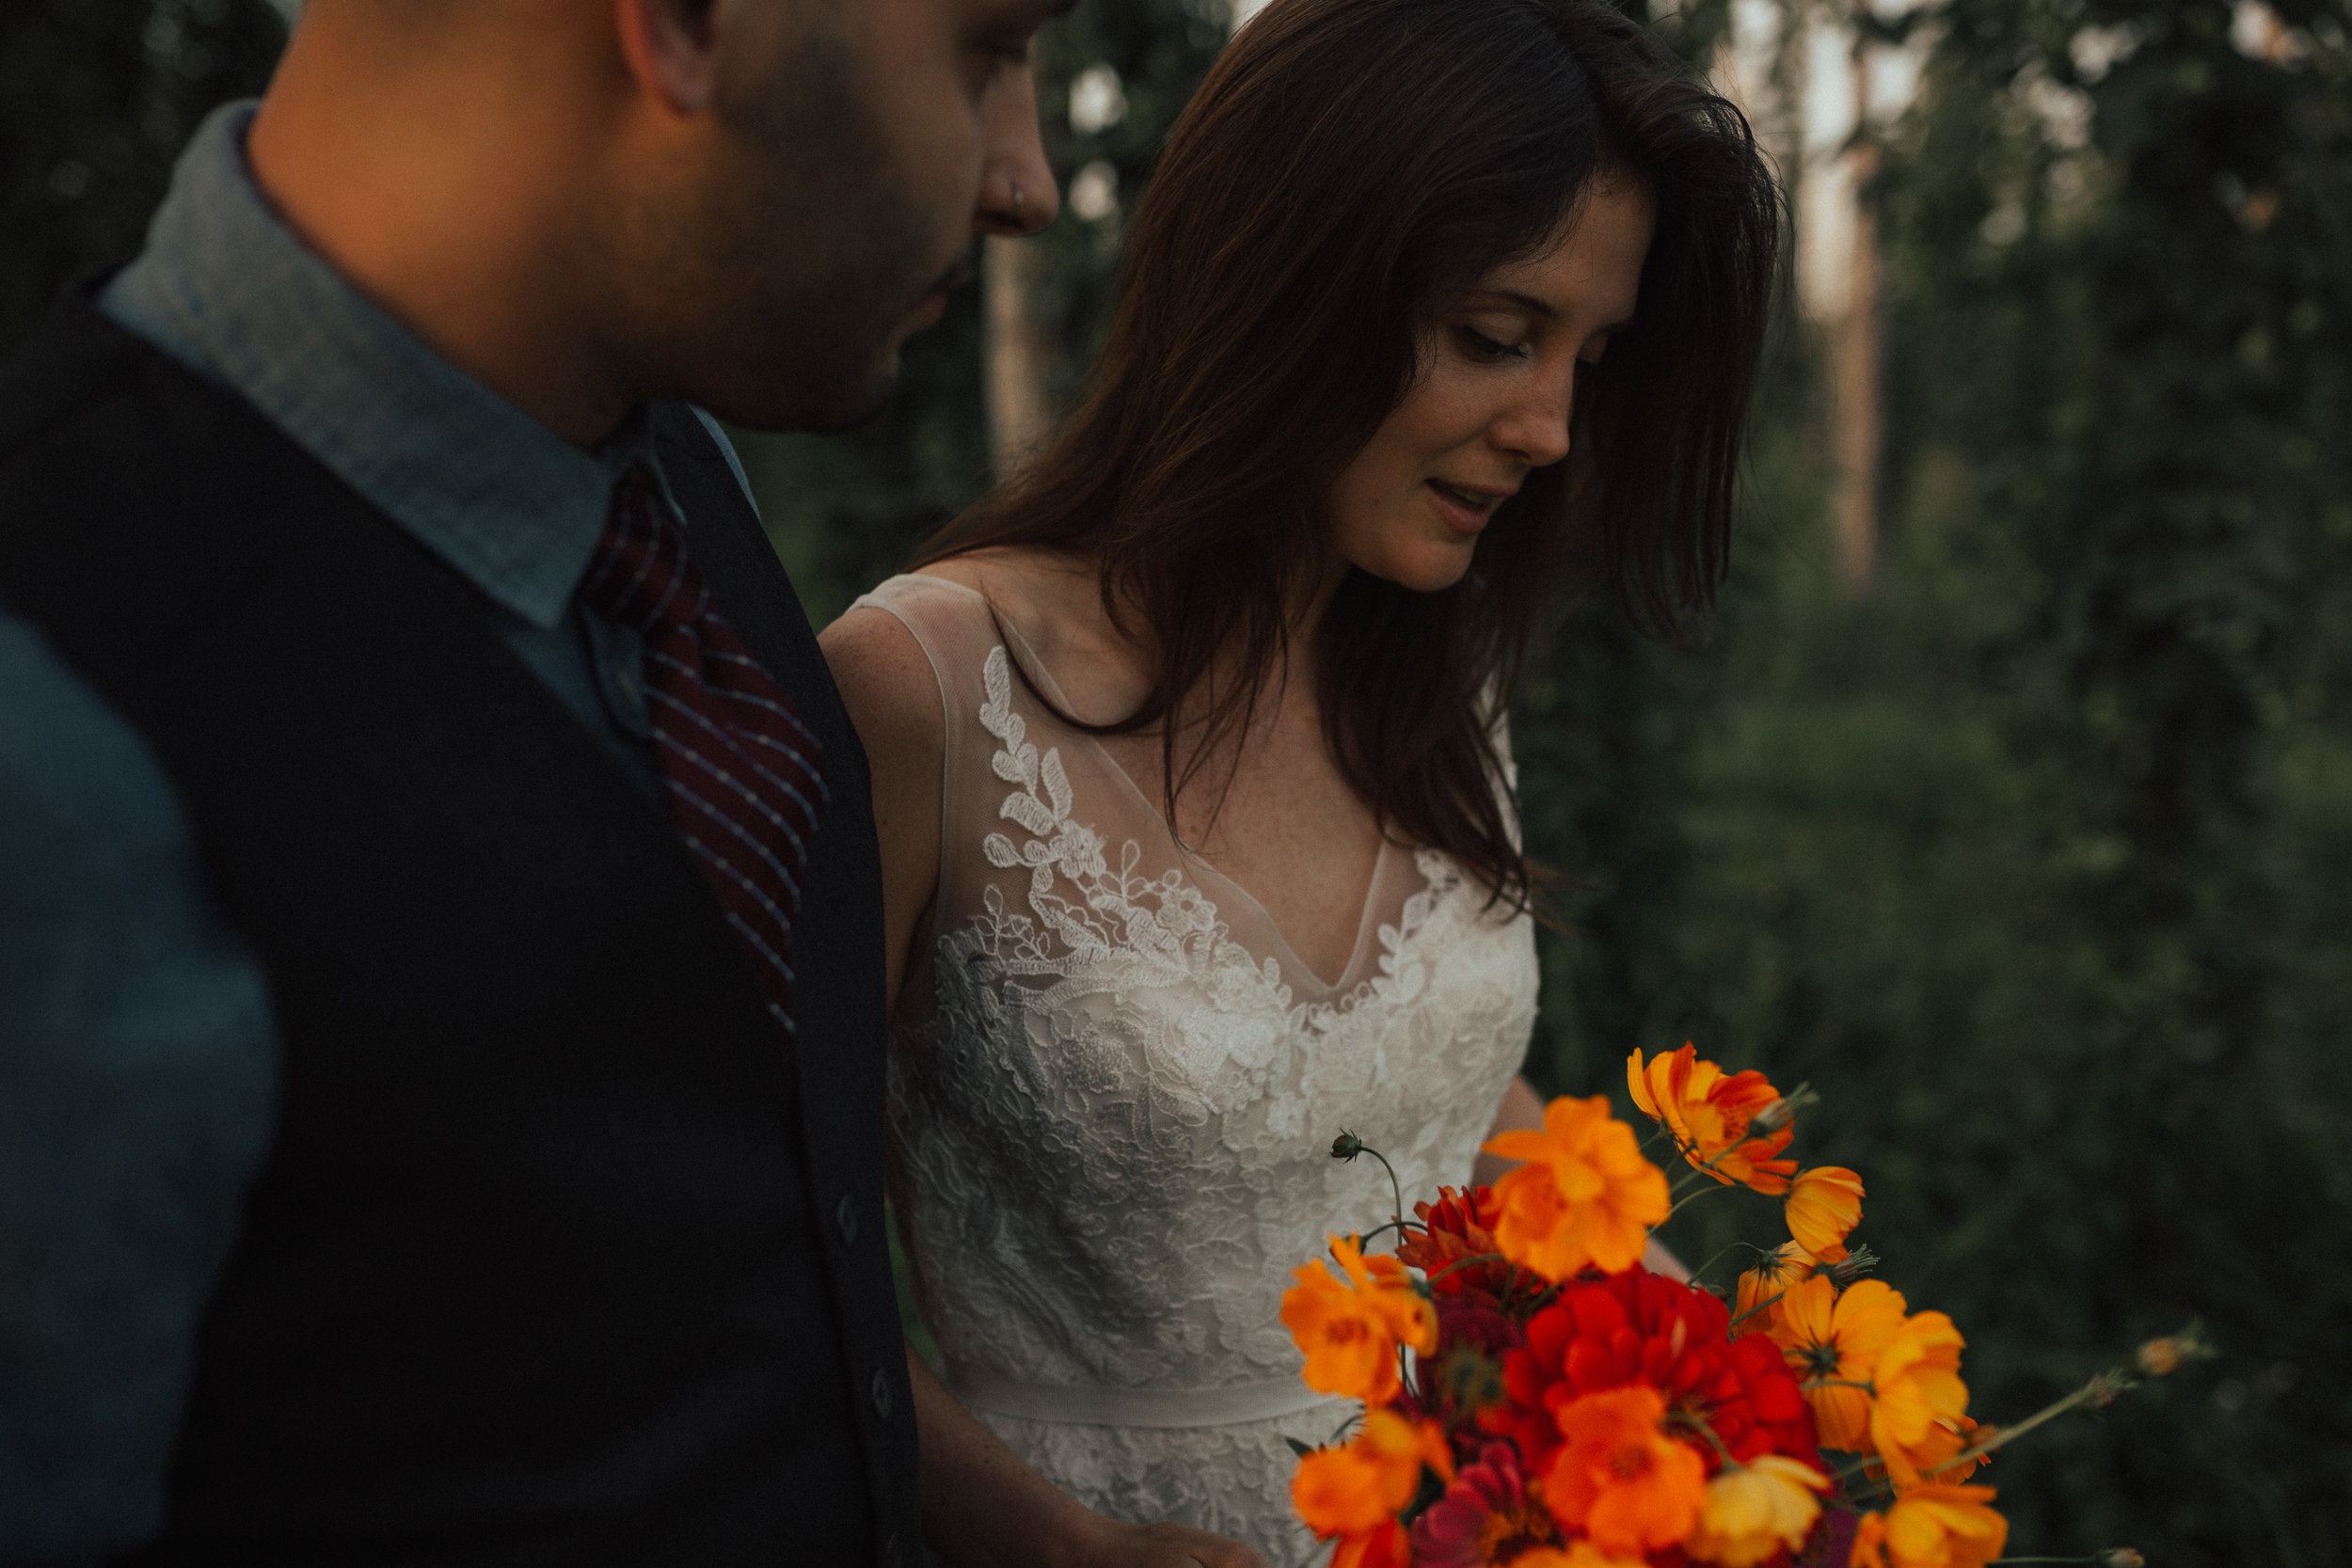 upstate_new_york_wedding_photos_0010.JPG